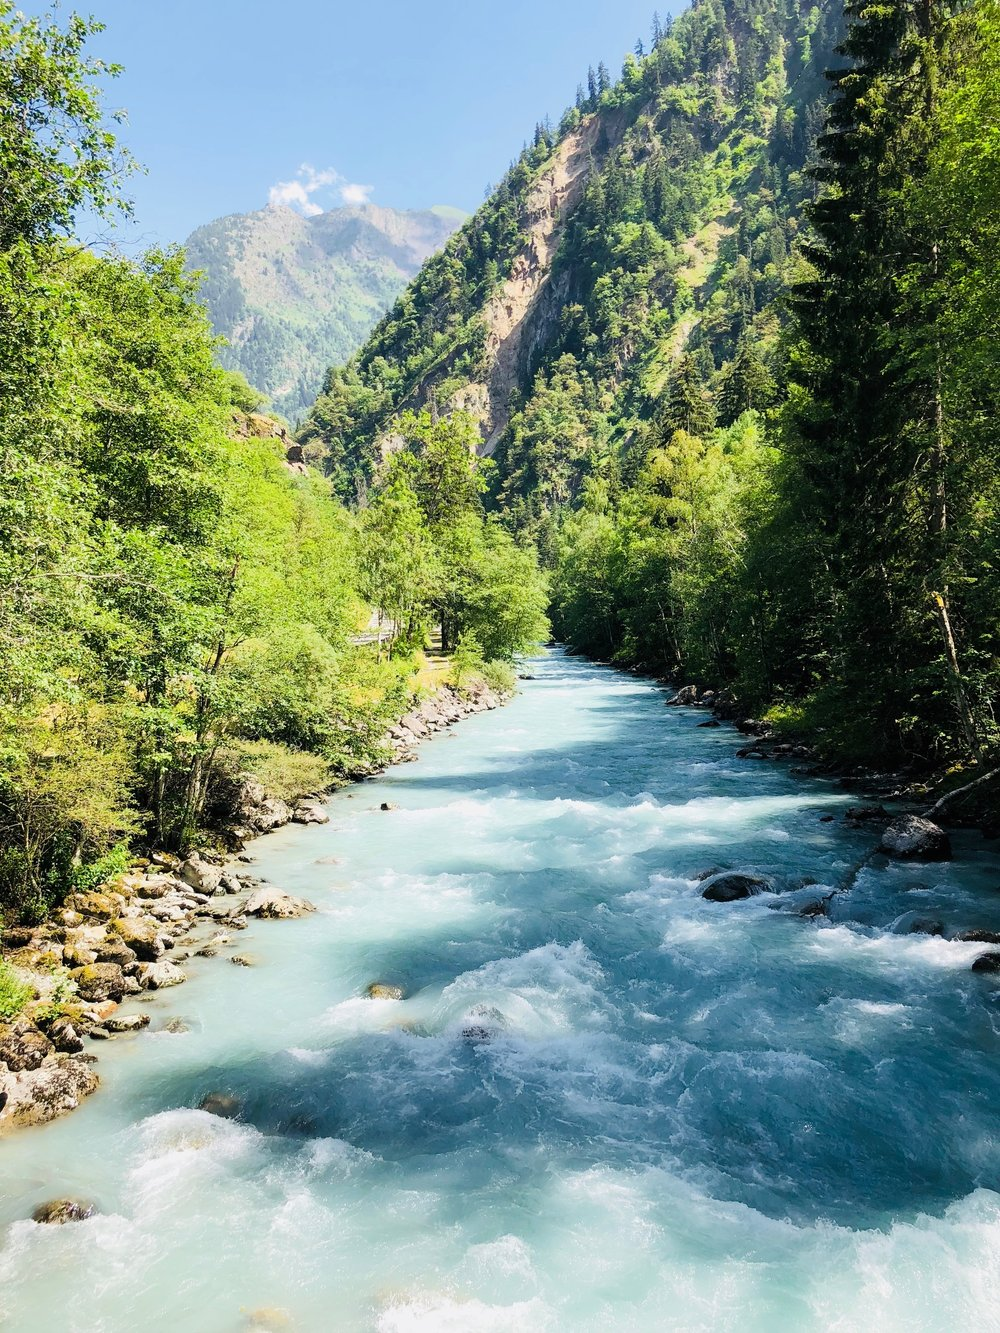 Road to venosc river view.jpg